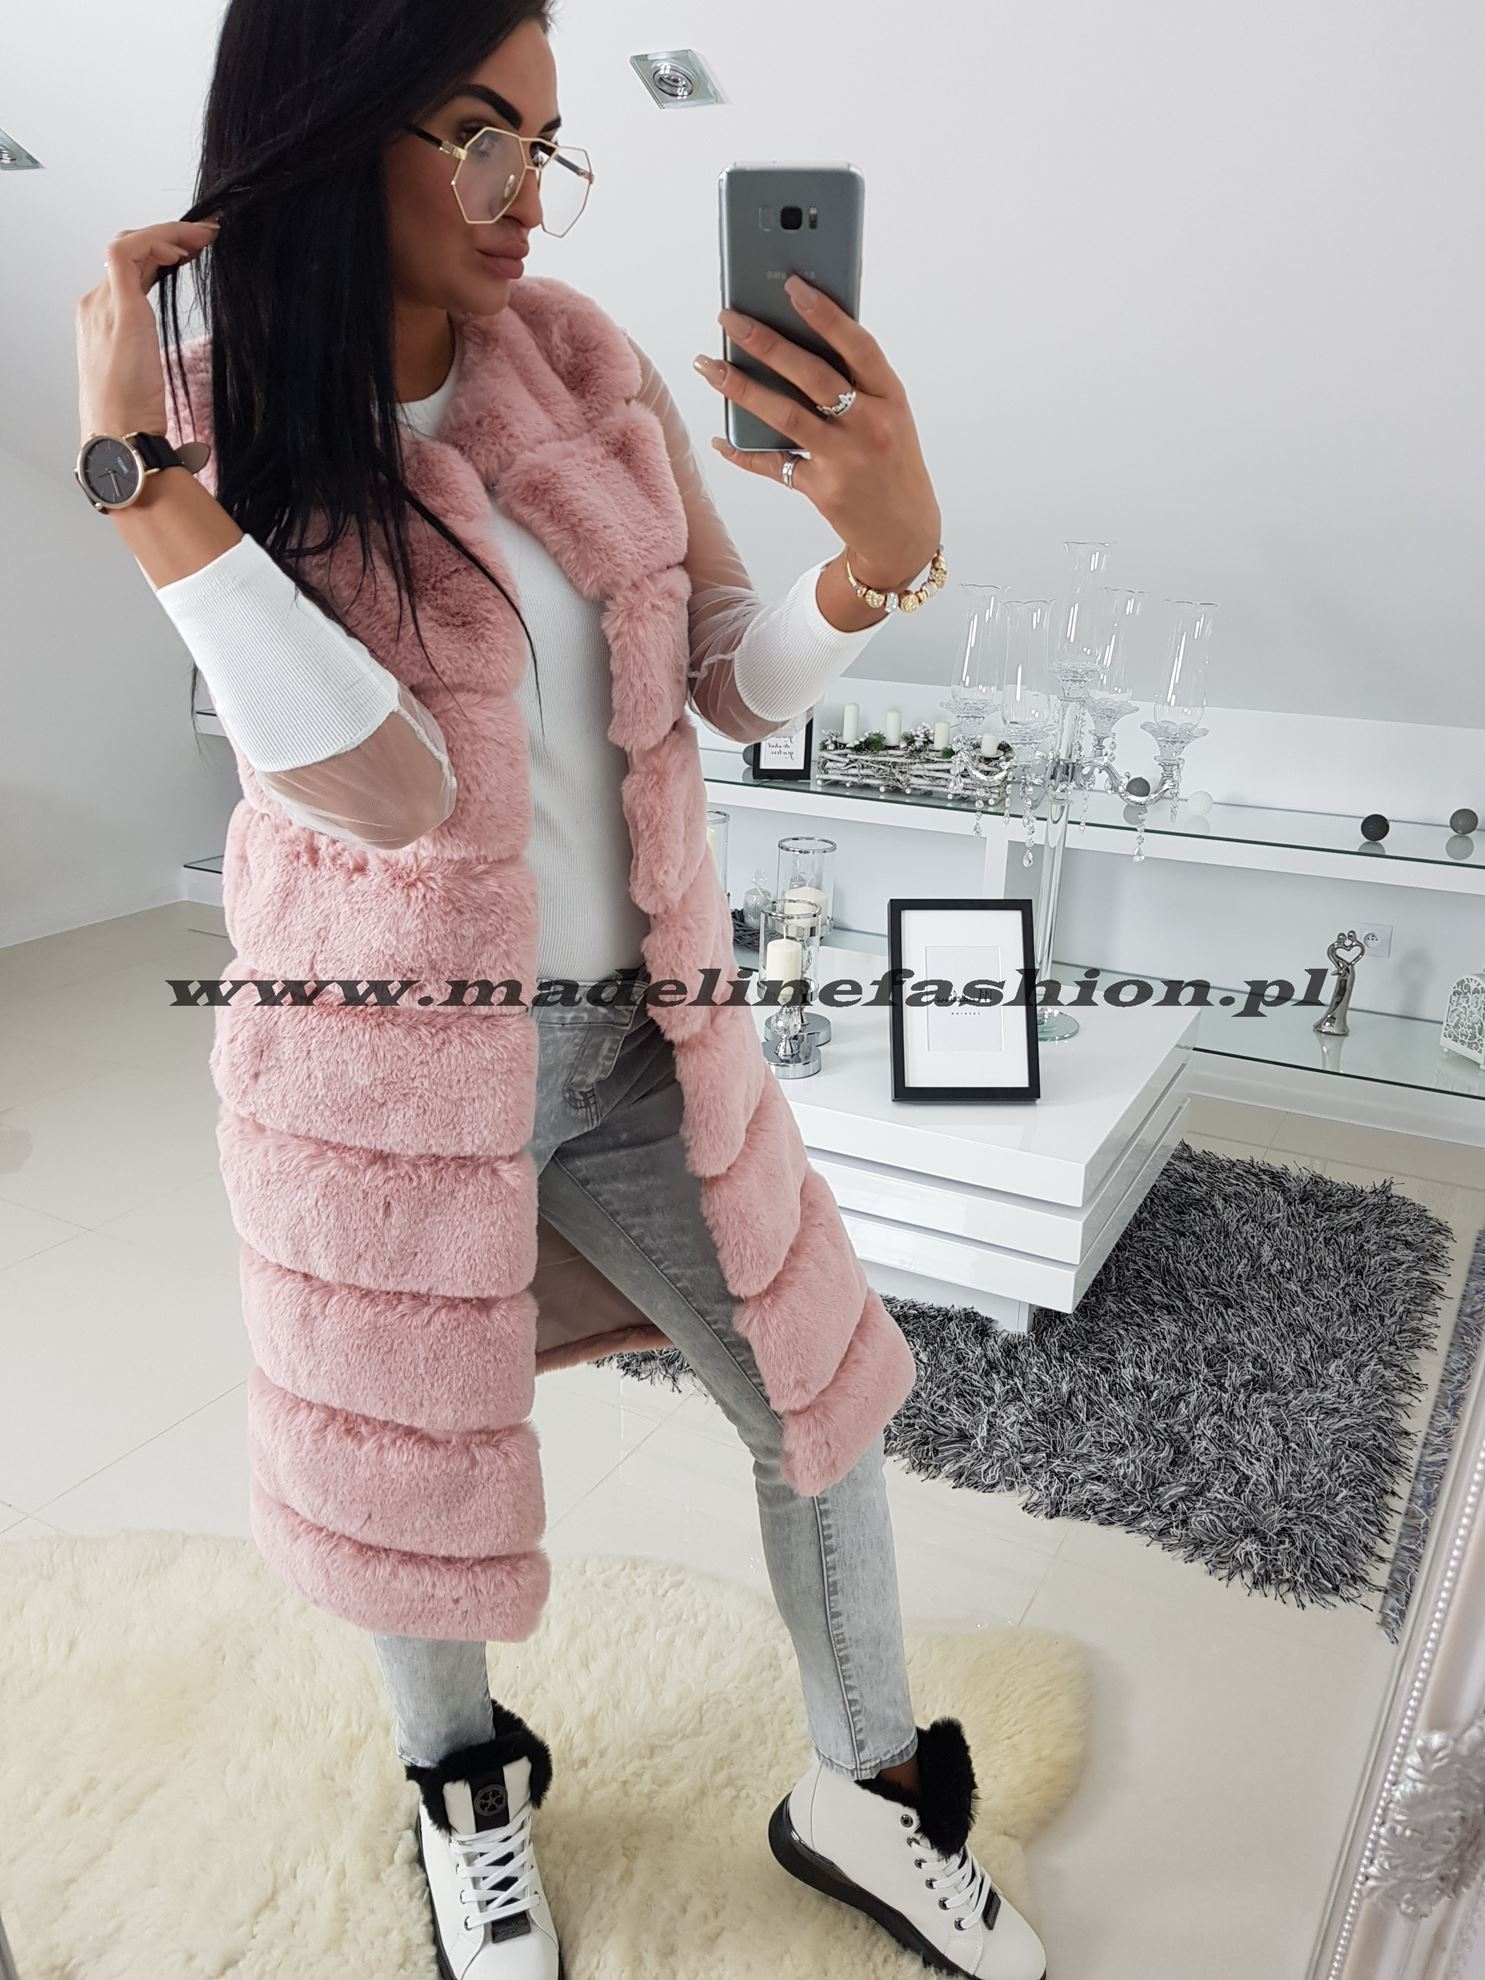 products 0003372 kamizelka rozowa mis dluga 1